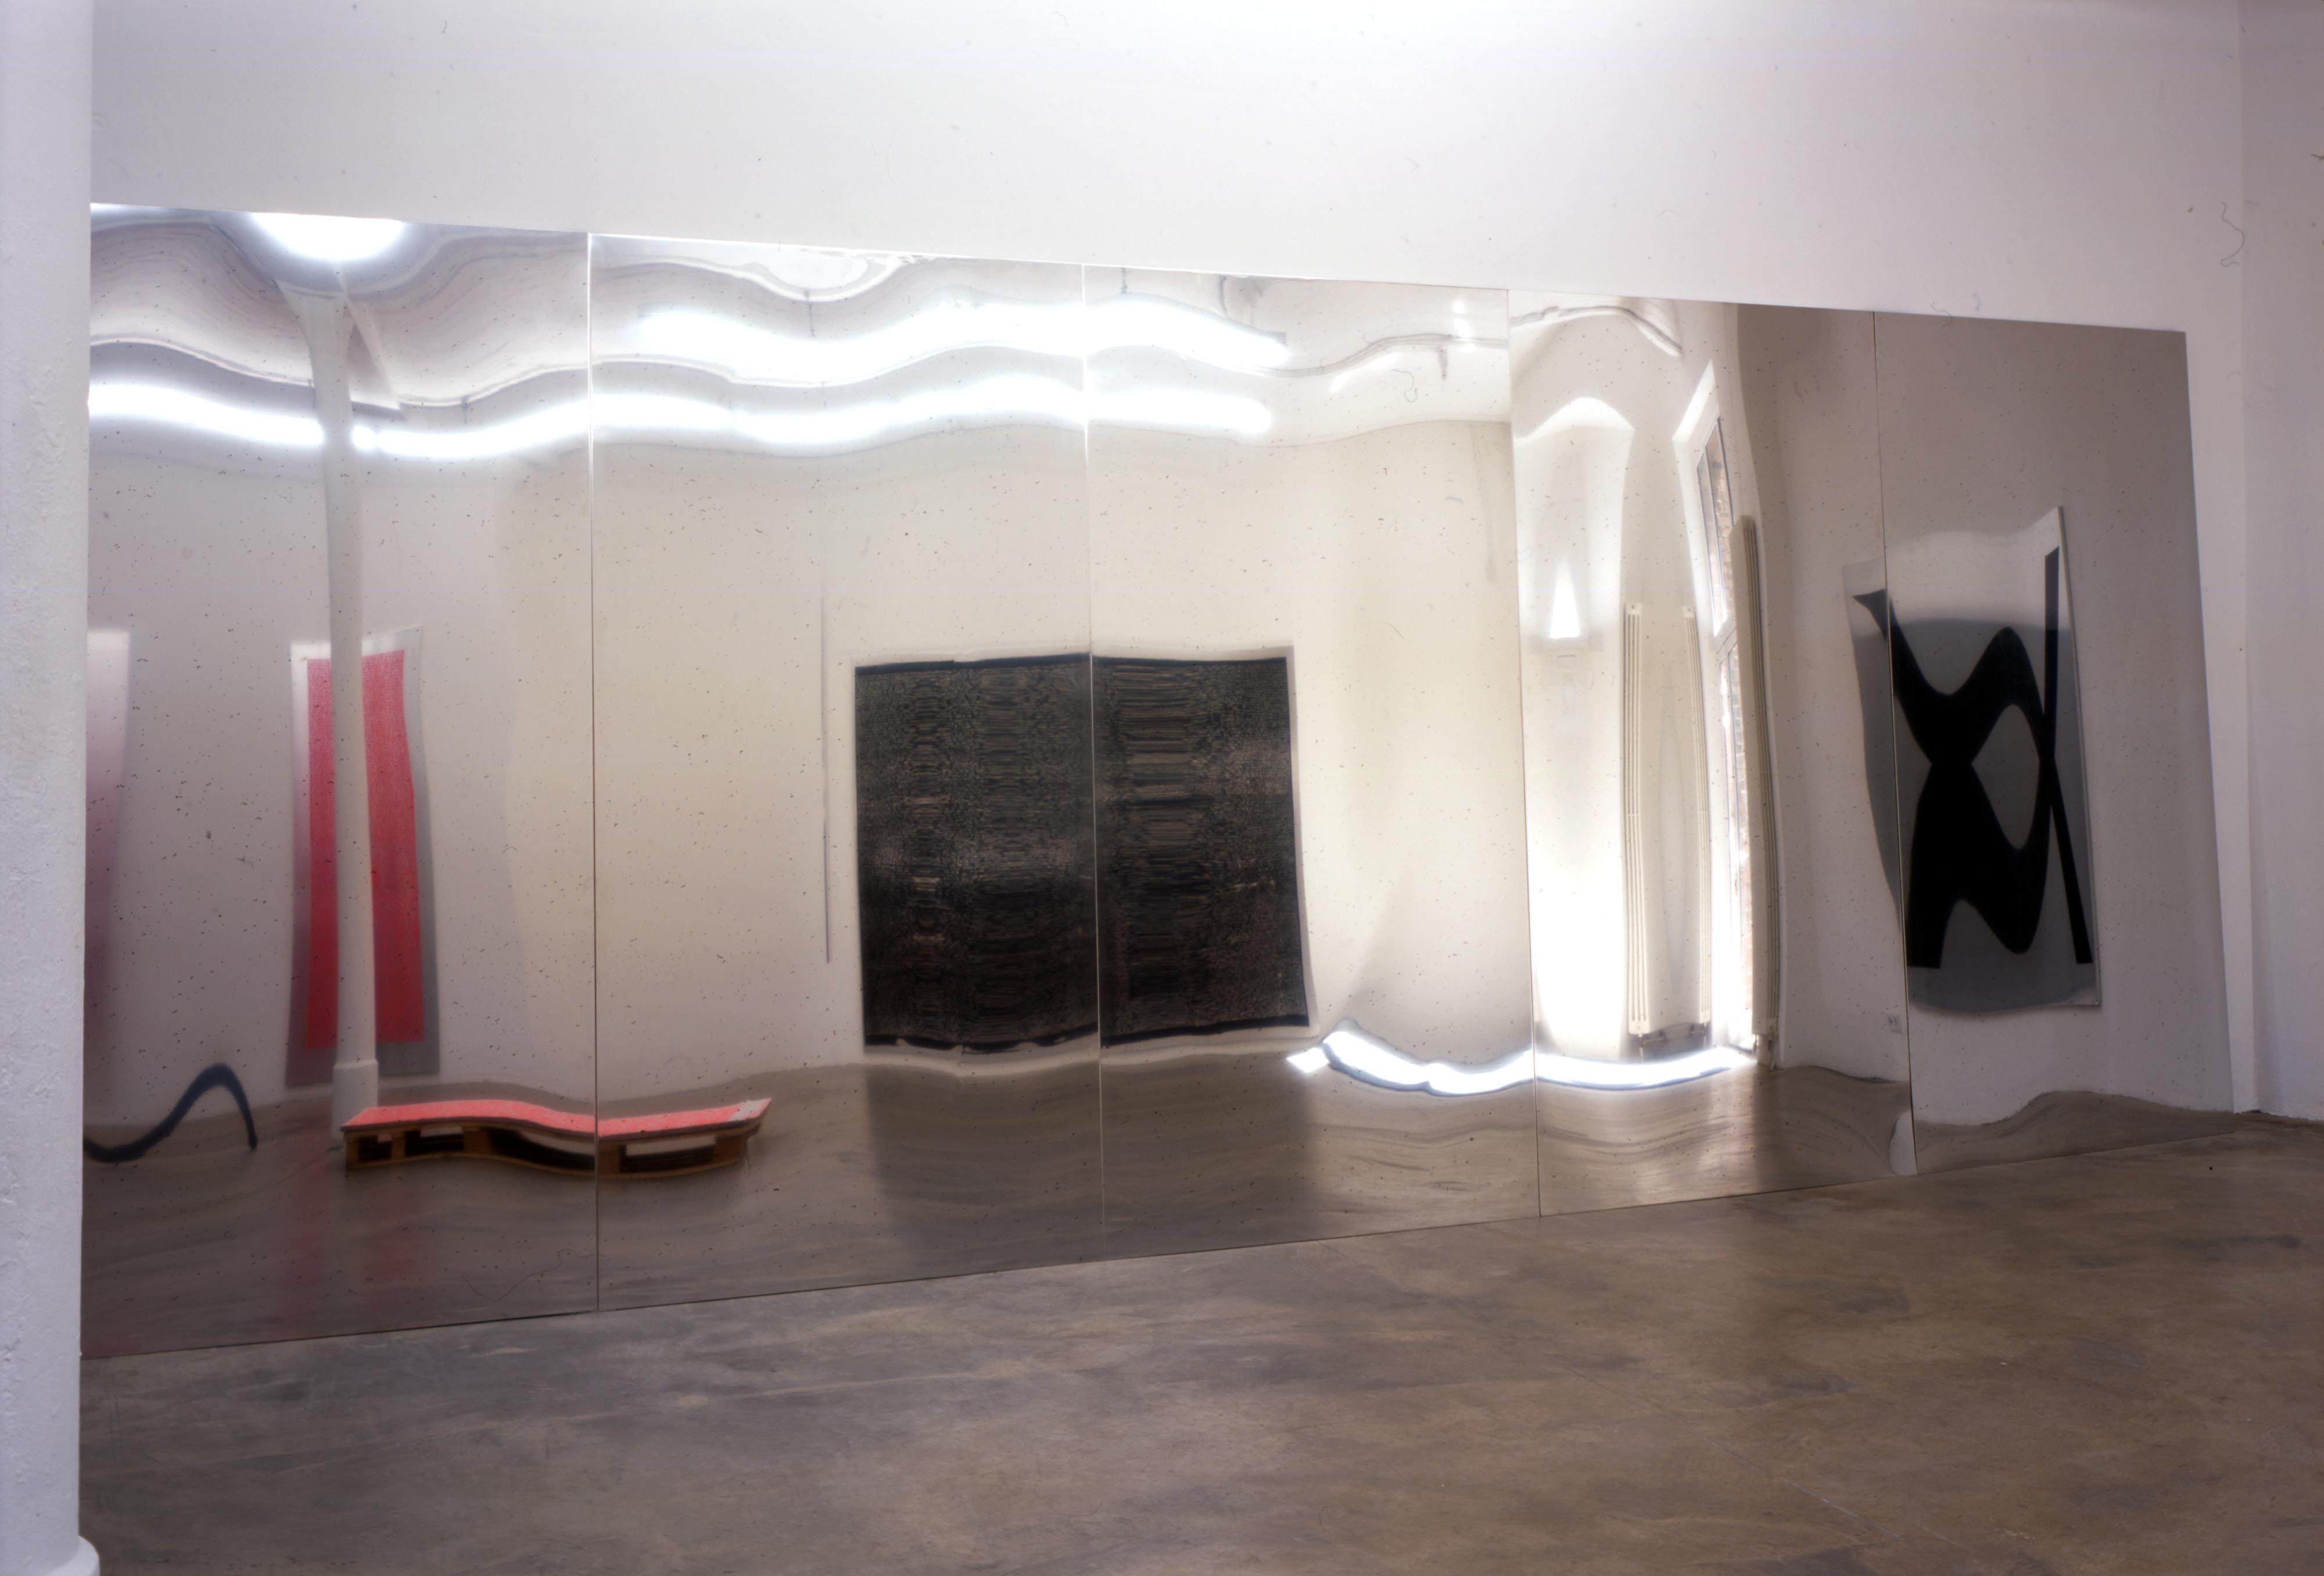 Galerie Barbara Thumm \ Fiona Banner aka The Vanity Press – Arsewoman in Wonderland